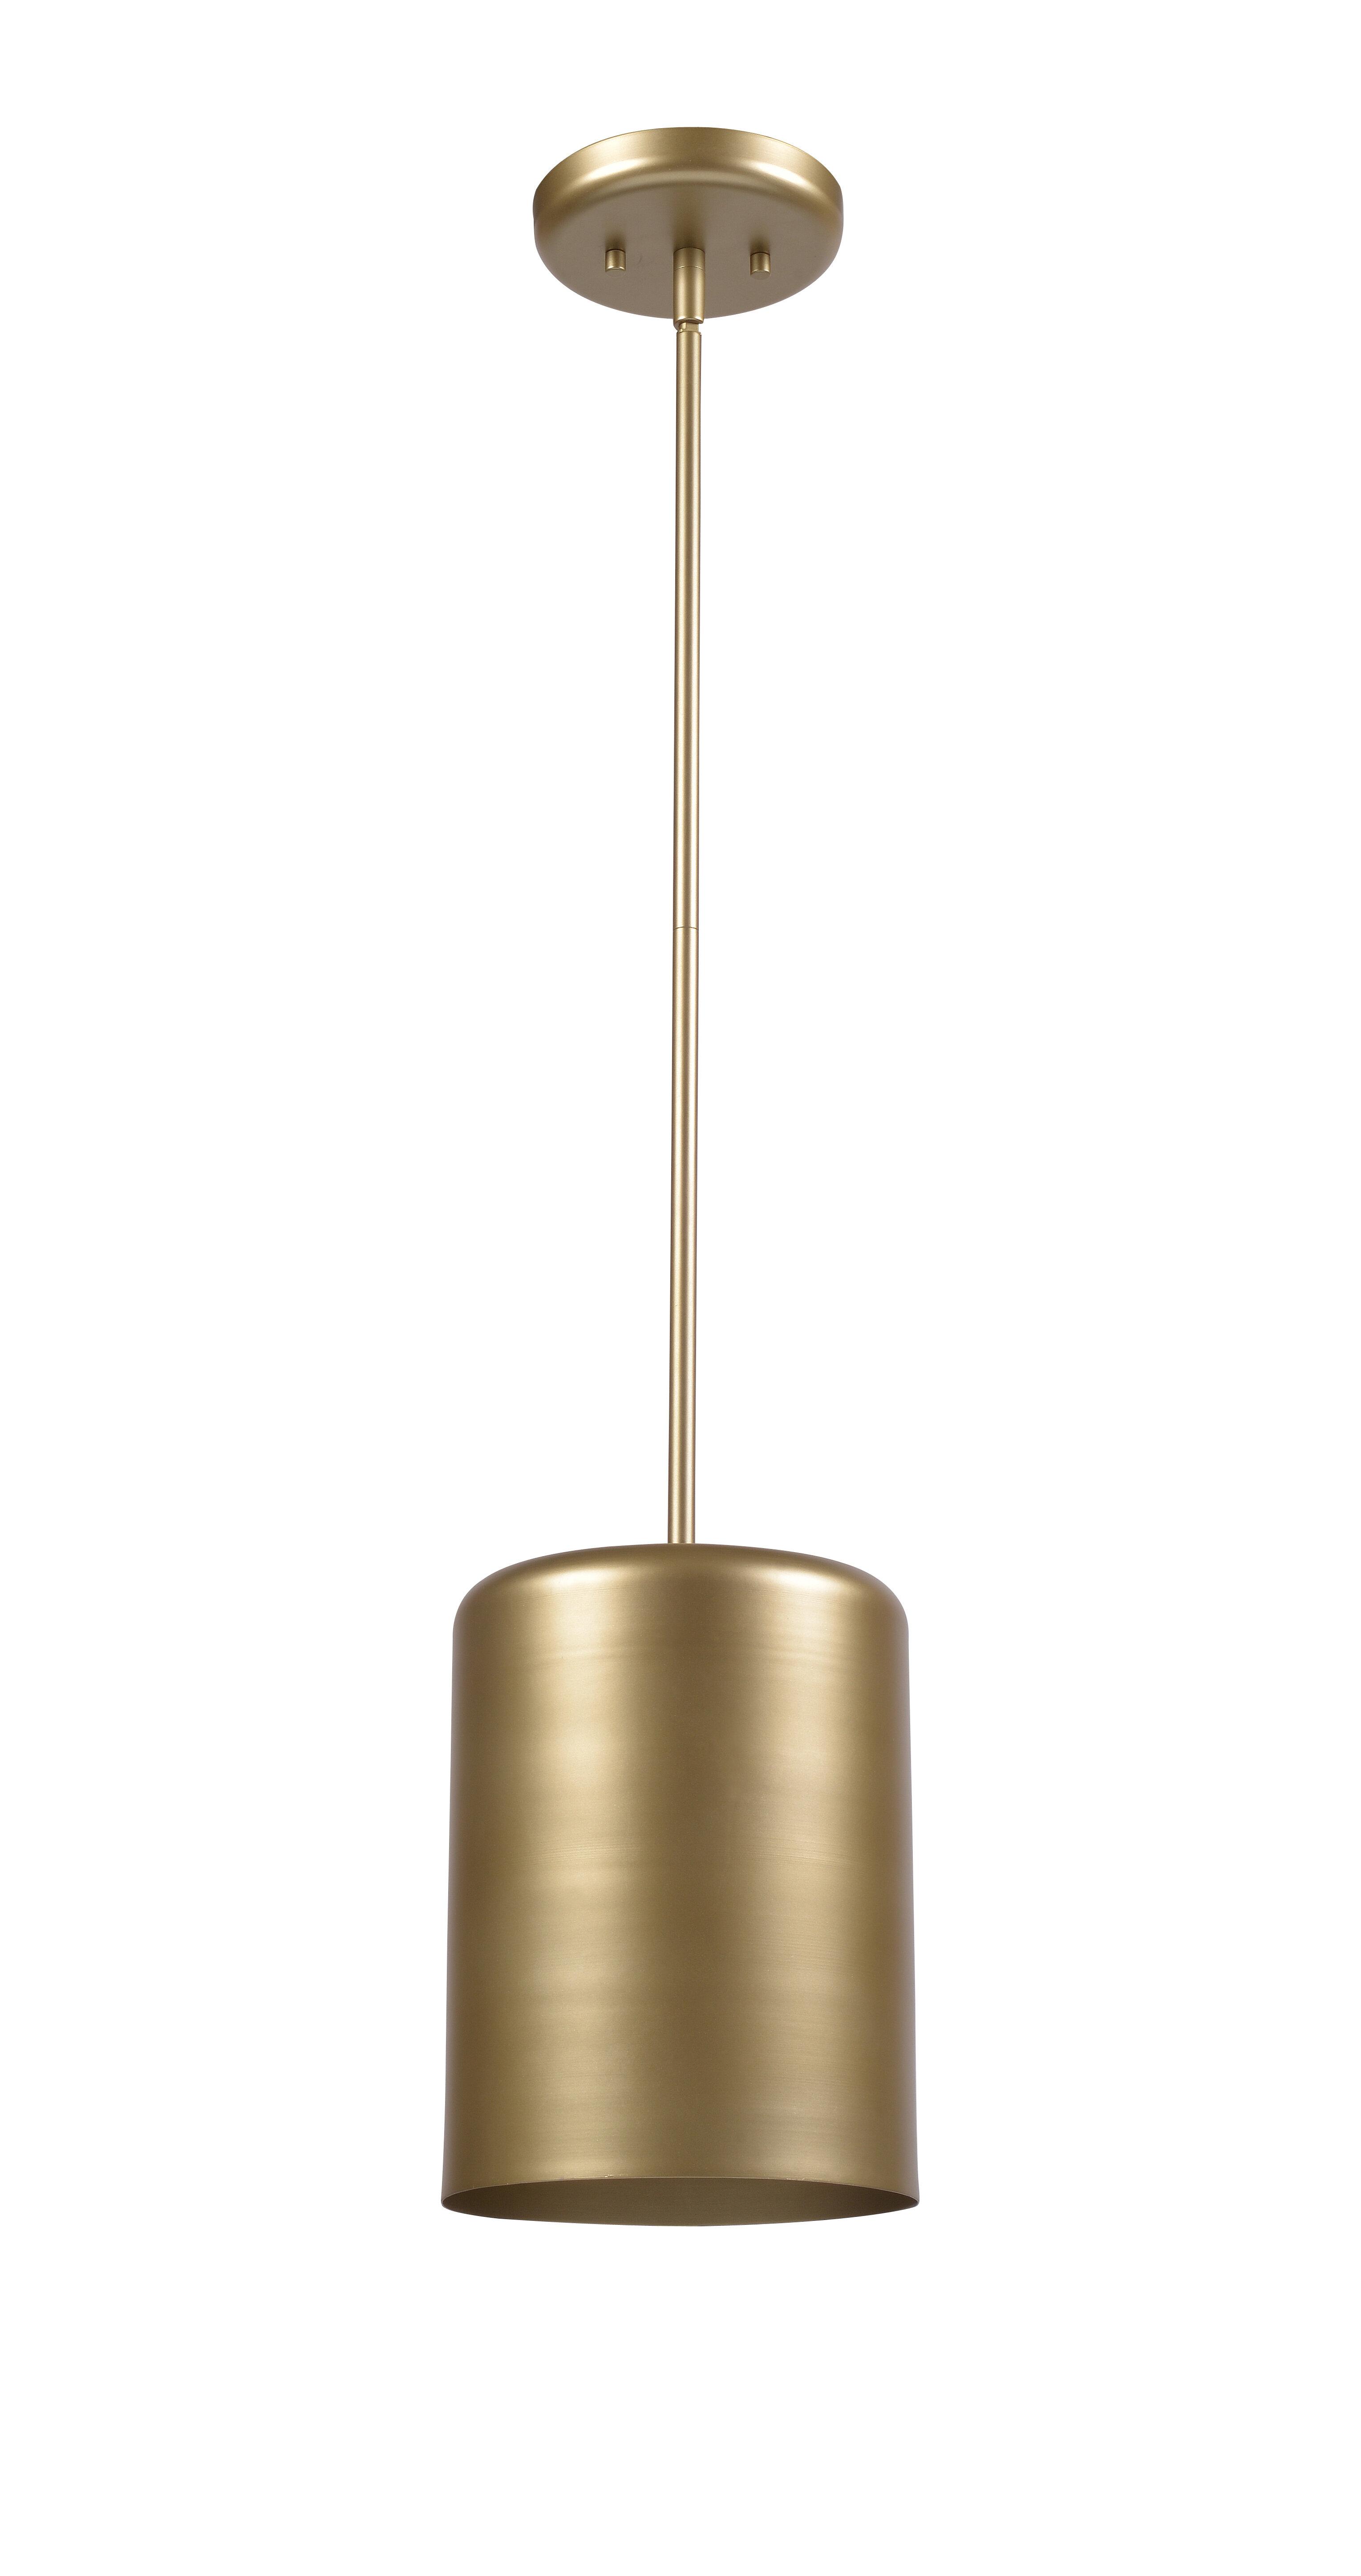 Anrey 1 Light Single Cylinder Pendant Reviews Allmodern